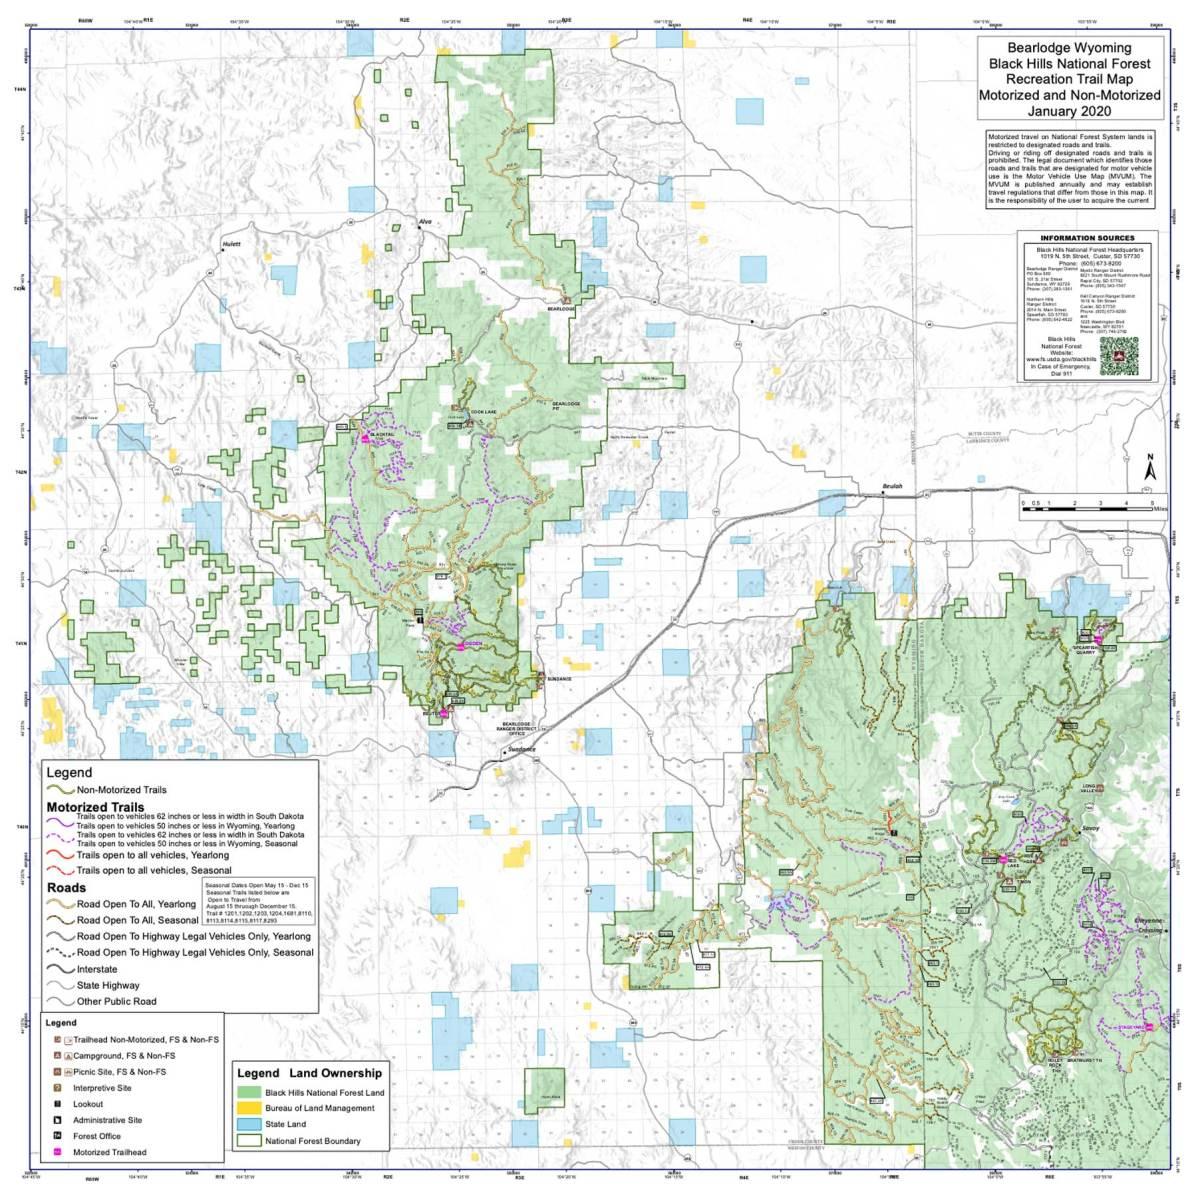 bear lodge ranger district map